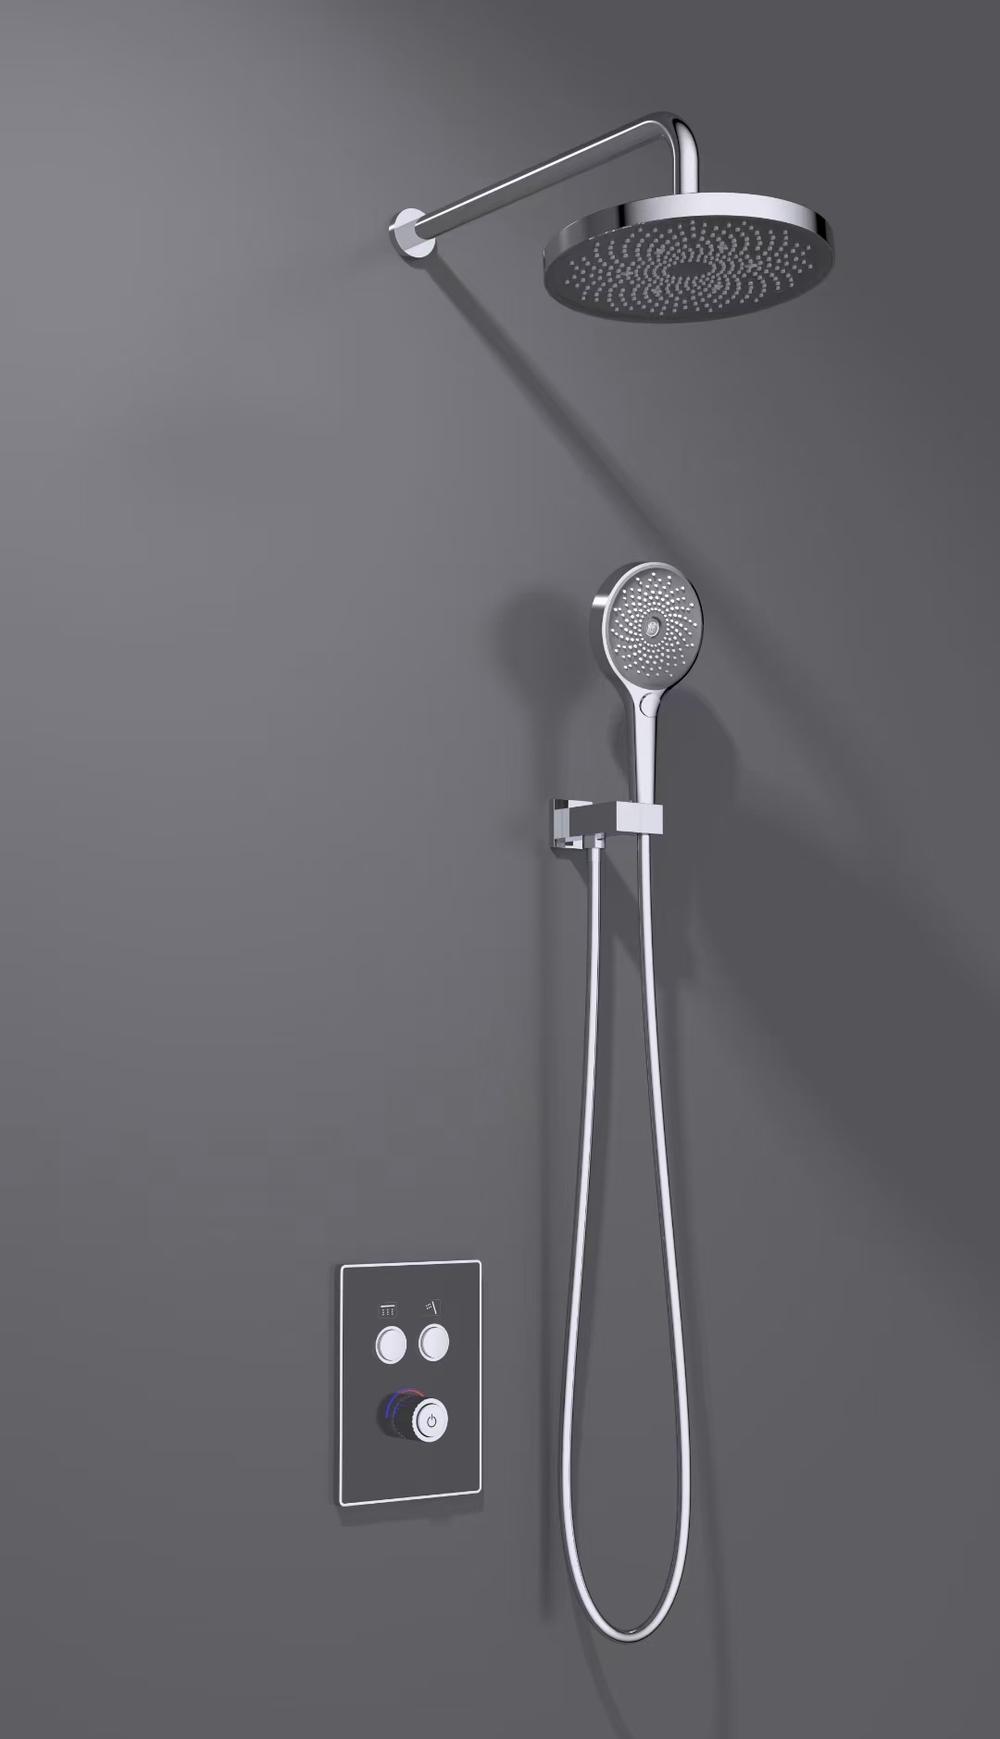 CBM Bathroom digital display  dark faucet concealed shower faucet luxury wall-mounted shower valve set bathroom shower set black white colors